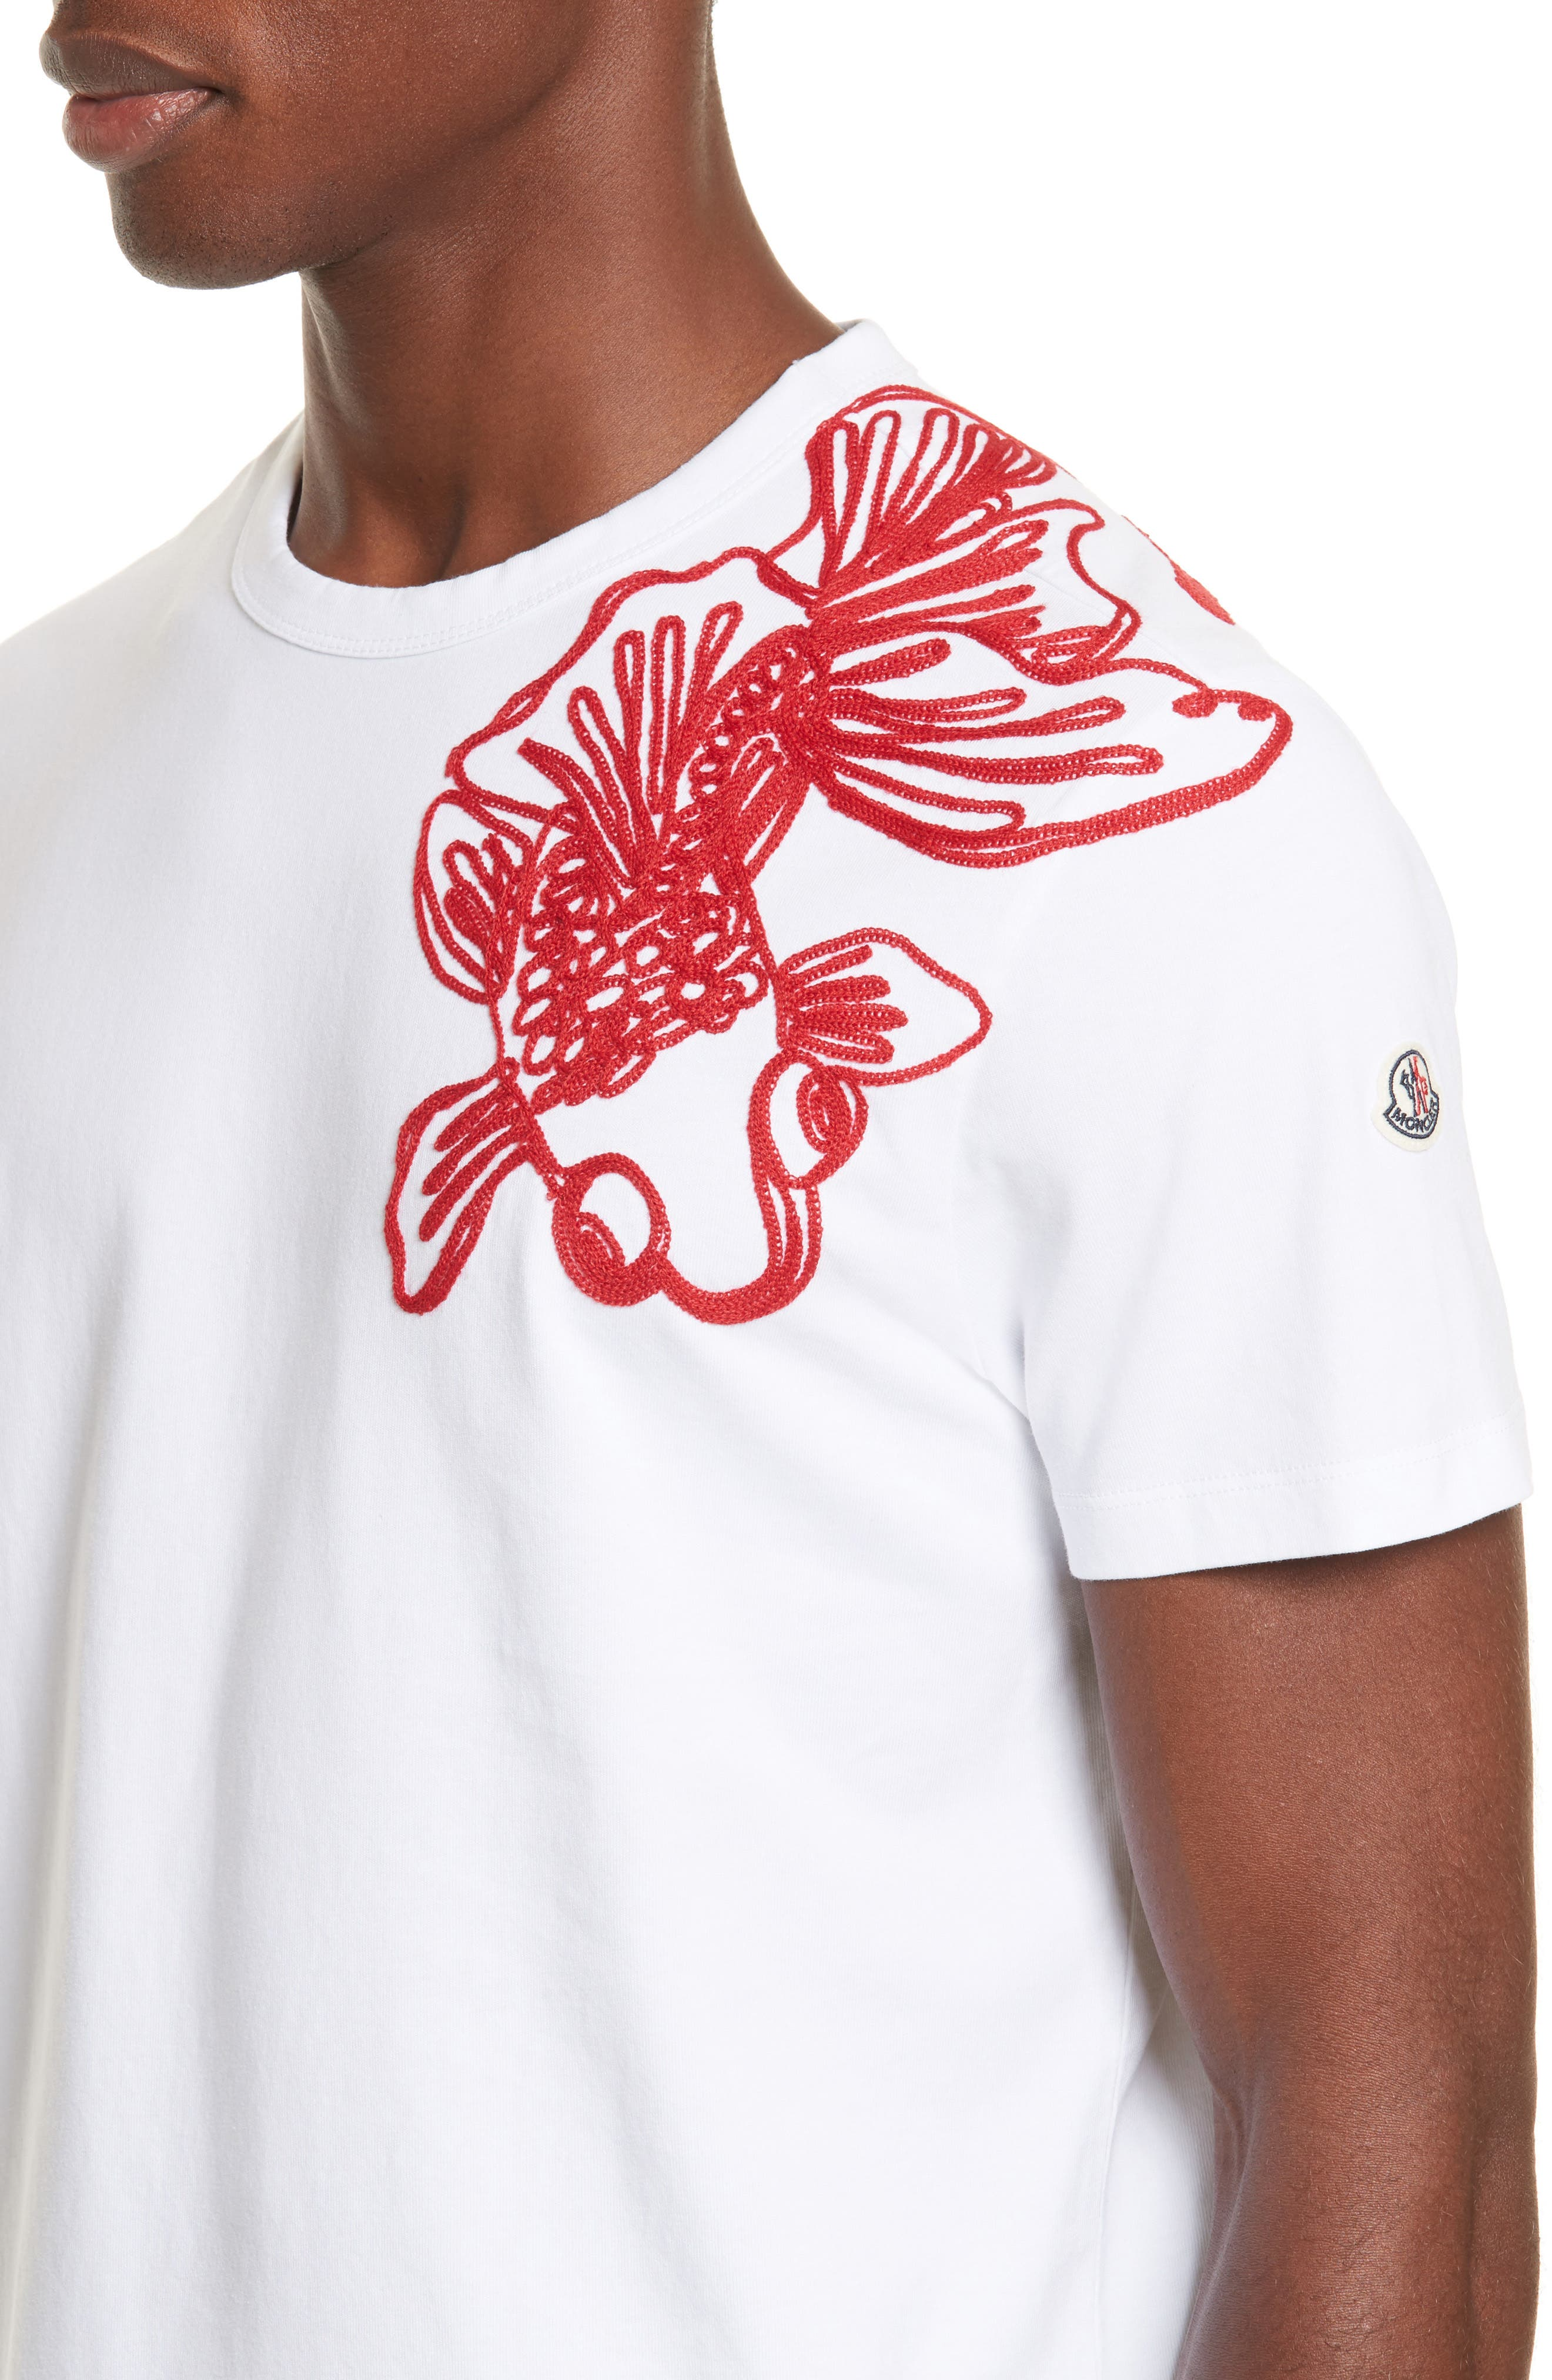 Embroidered Koi Fish T-Shirt,                             Alternate thumbnail 4, color,                             White